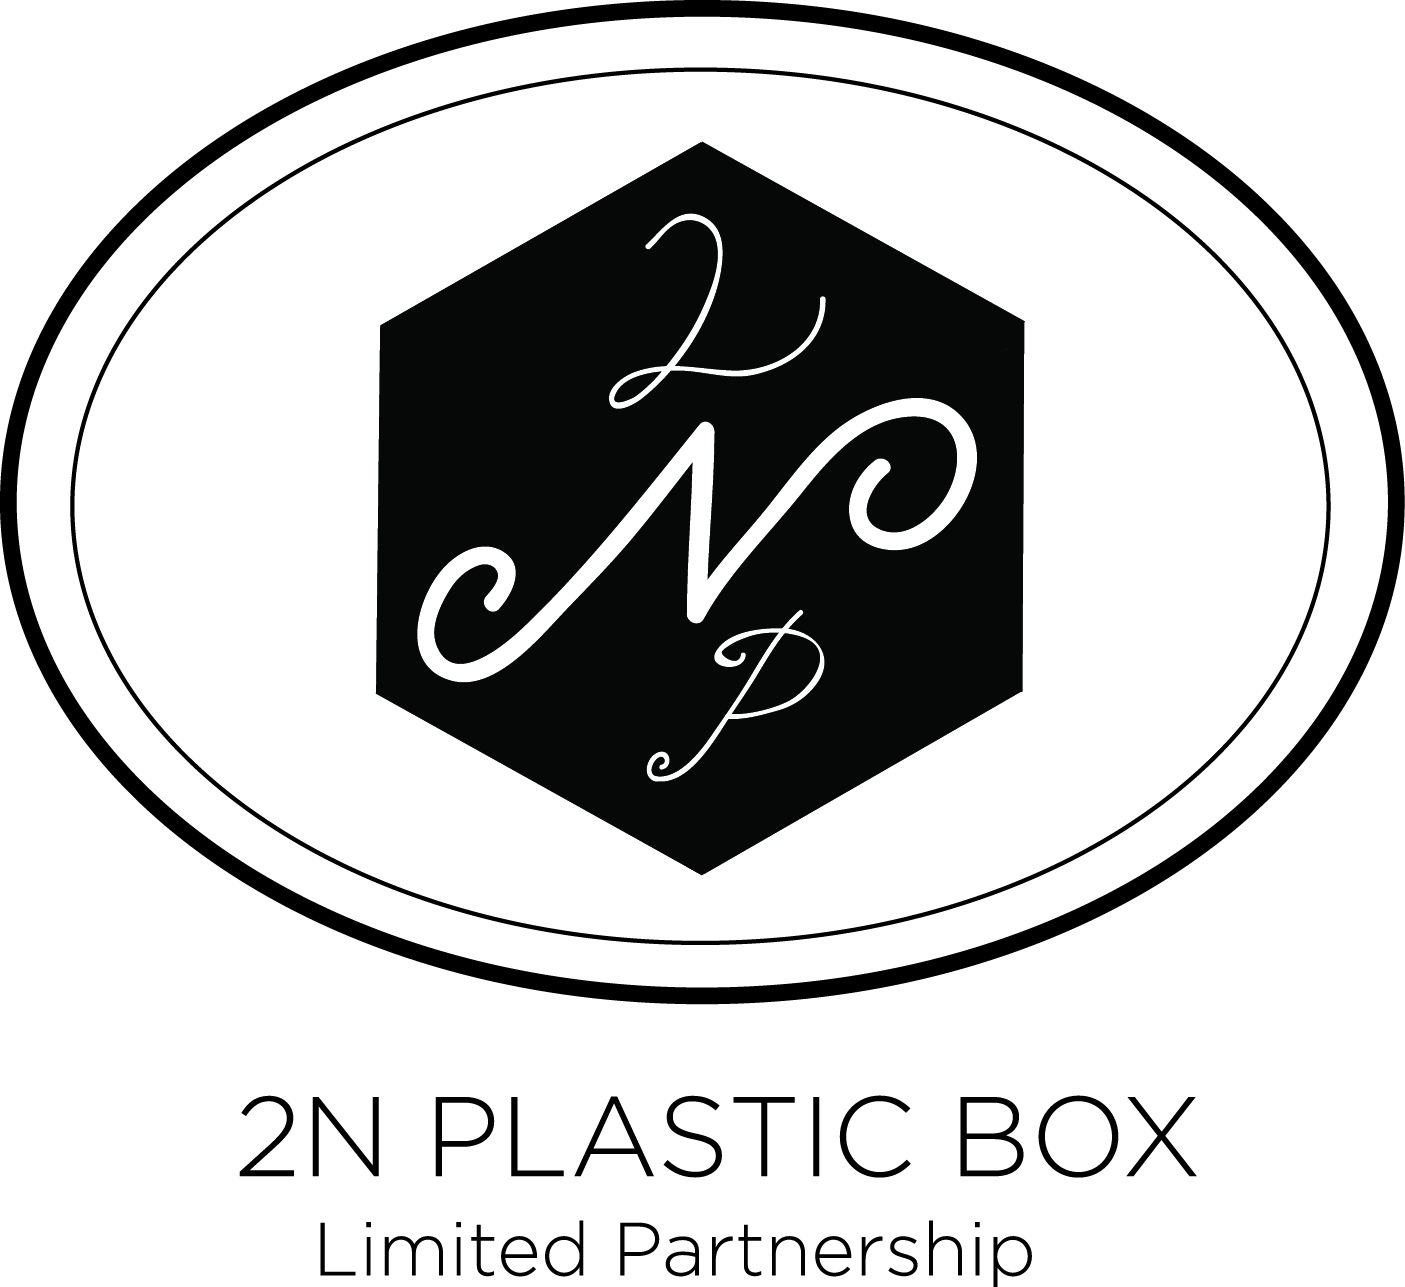 2nplasticbox